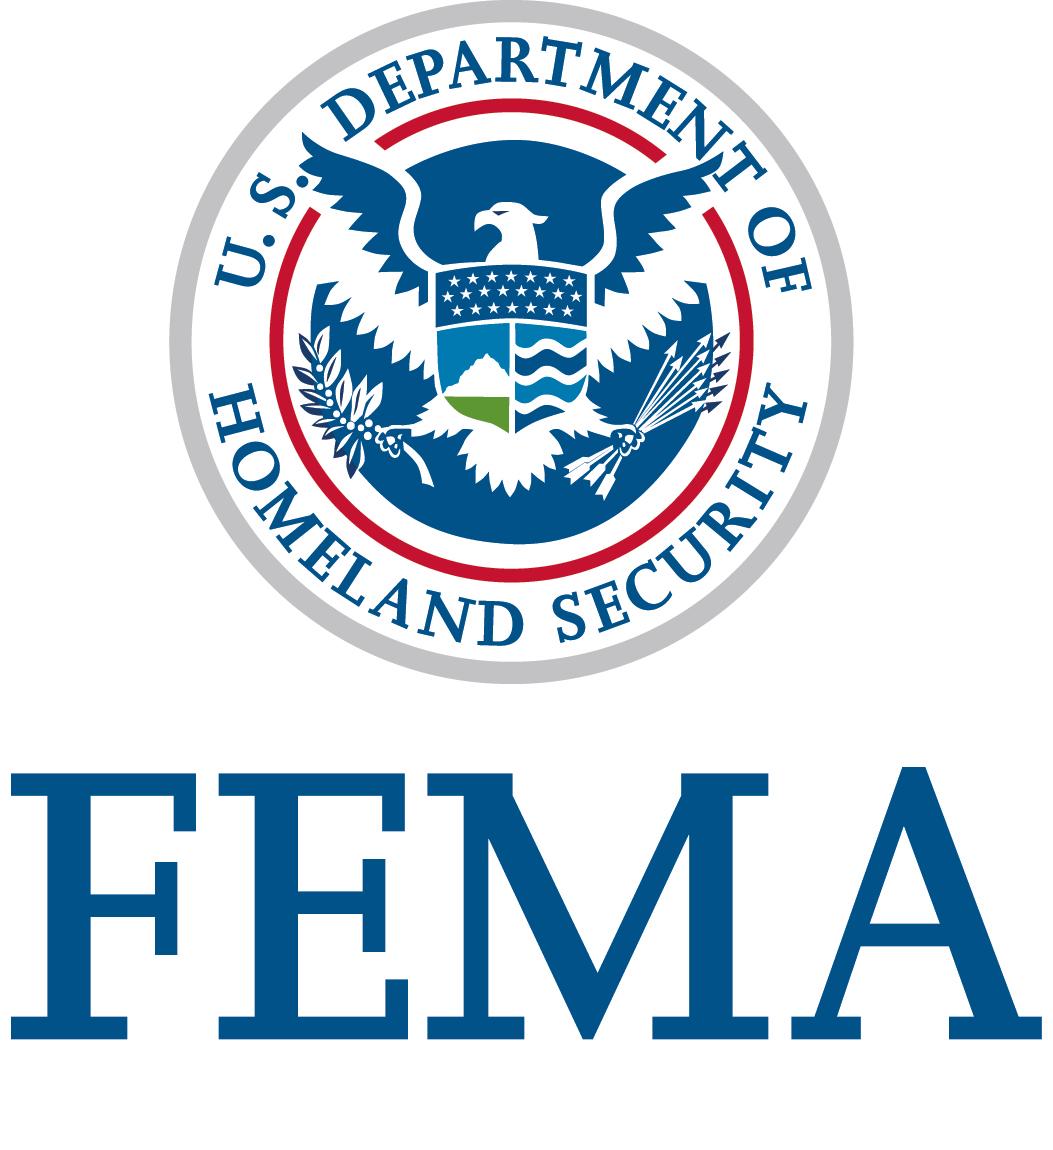 FEMA_logo_large-(1053x1150)(2).png